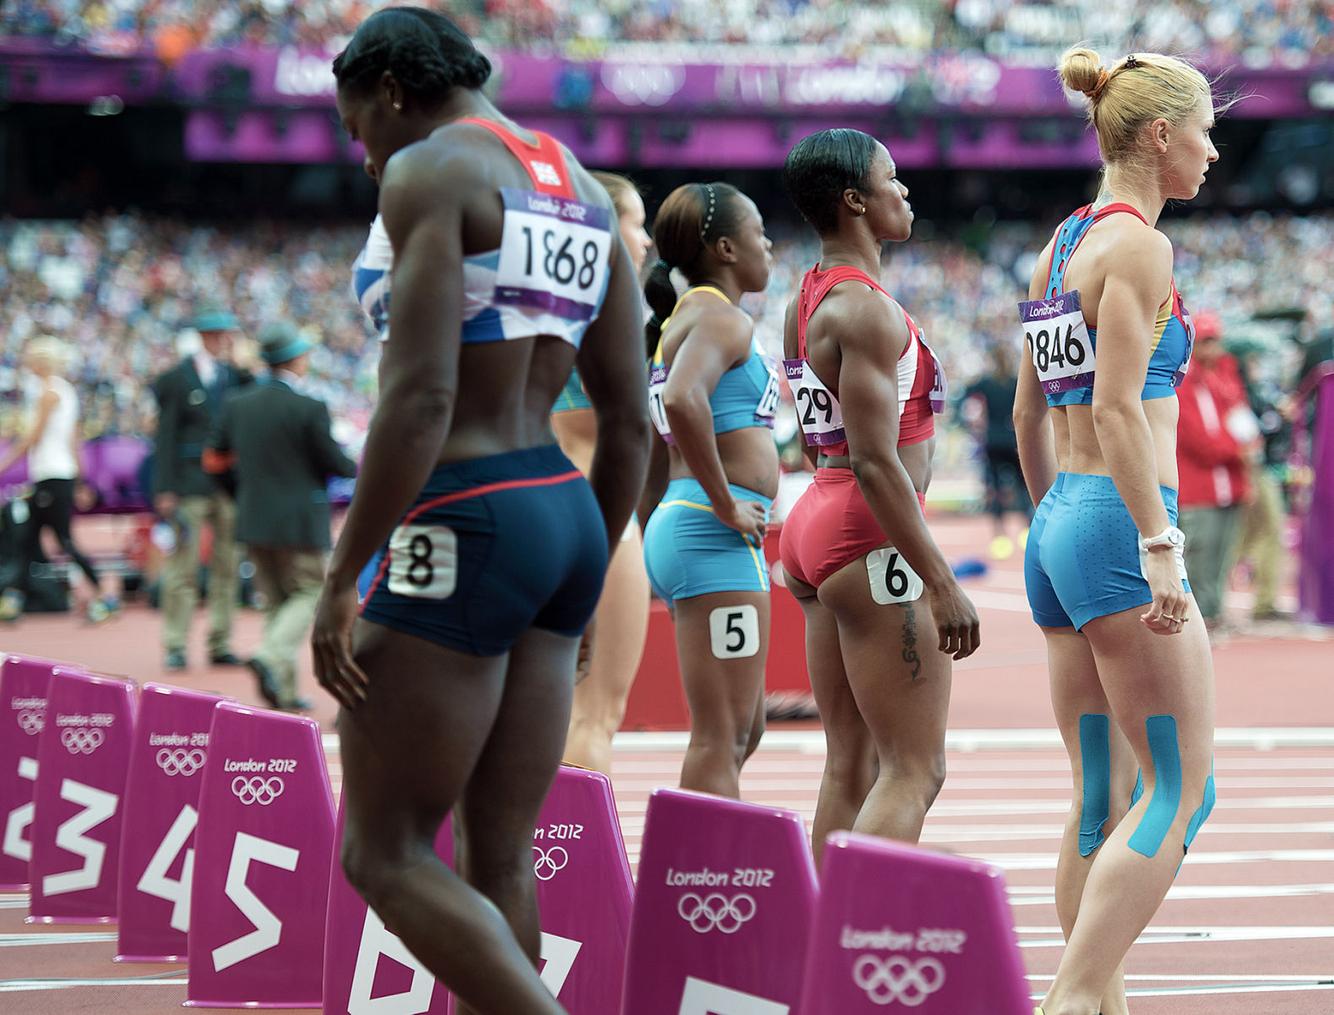 1london2012_carmelita_jeter_100m_start_track_and_field_image_jeff_cohen_photo_lb.jpg